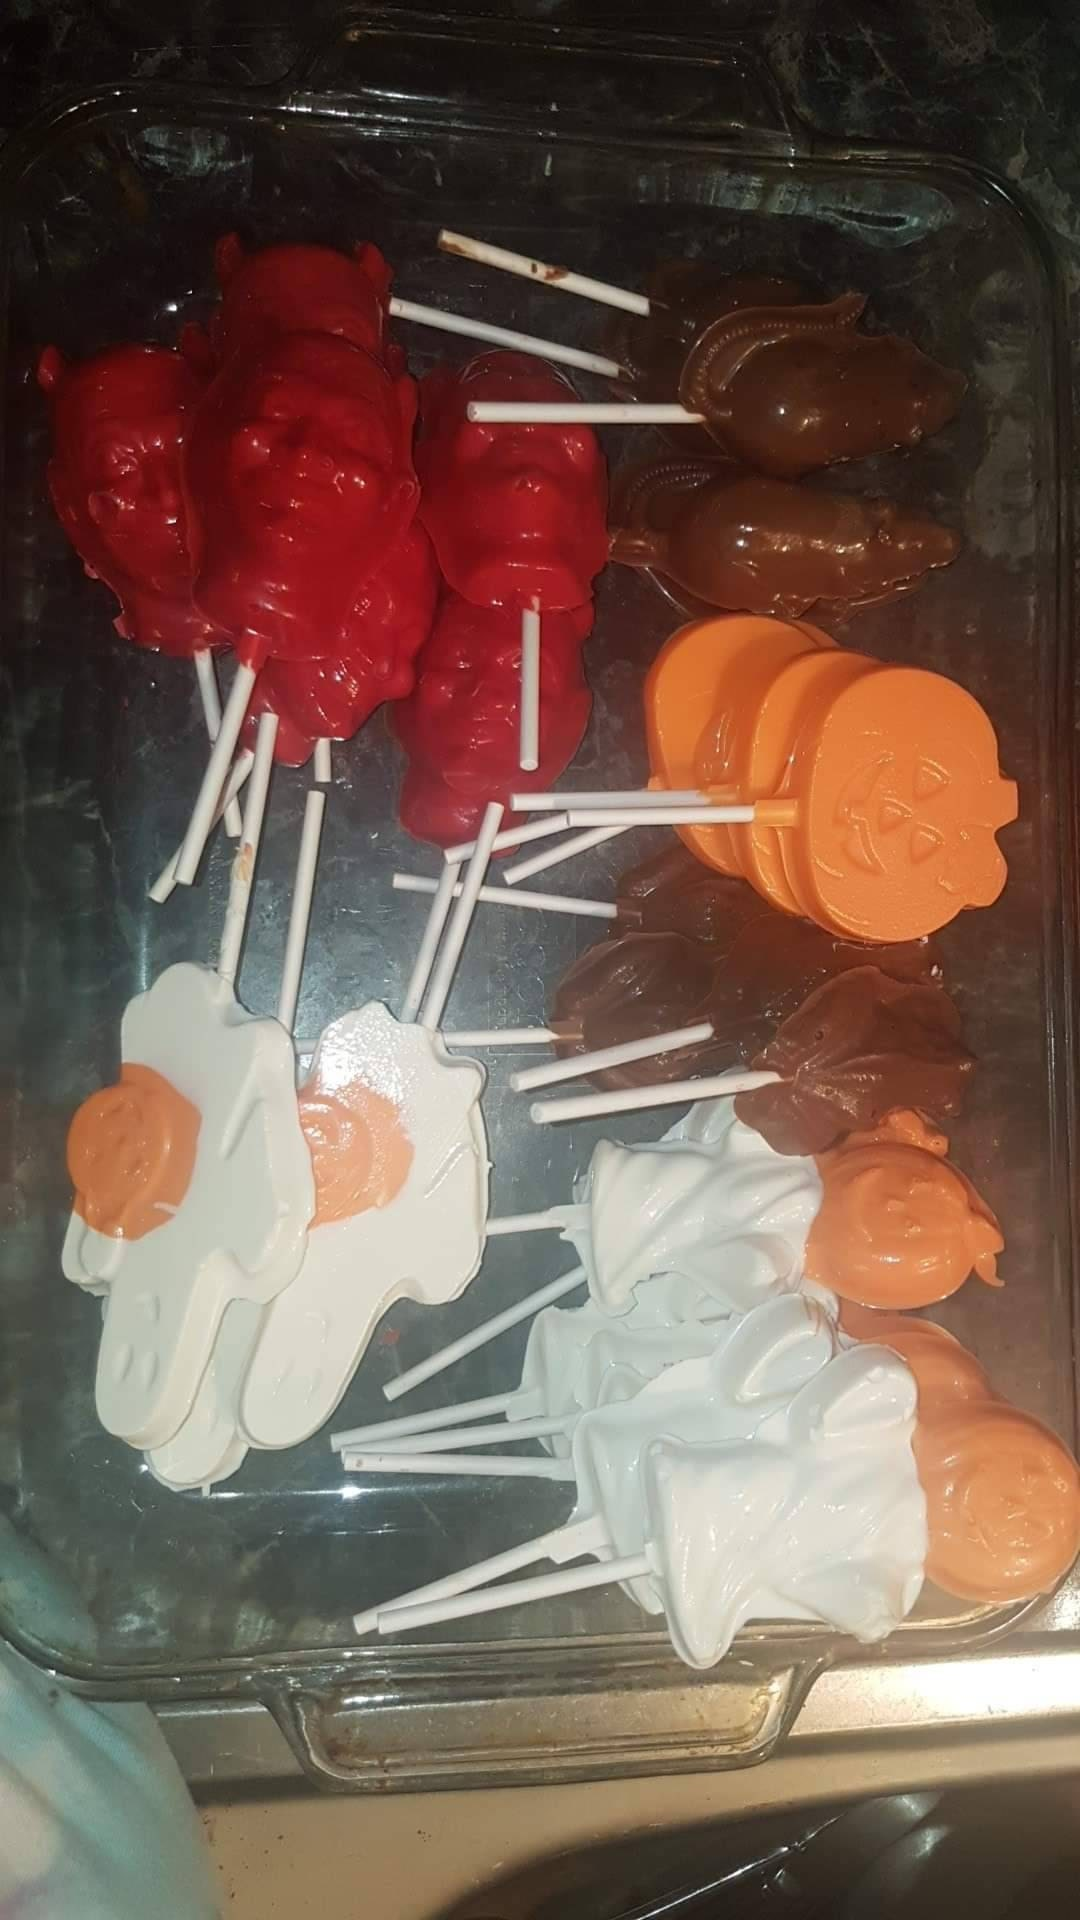 Lightning Bolt Lollipop Chocolate Candy Mold Harry Potter Party 3396 NEW